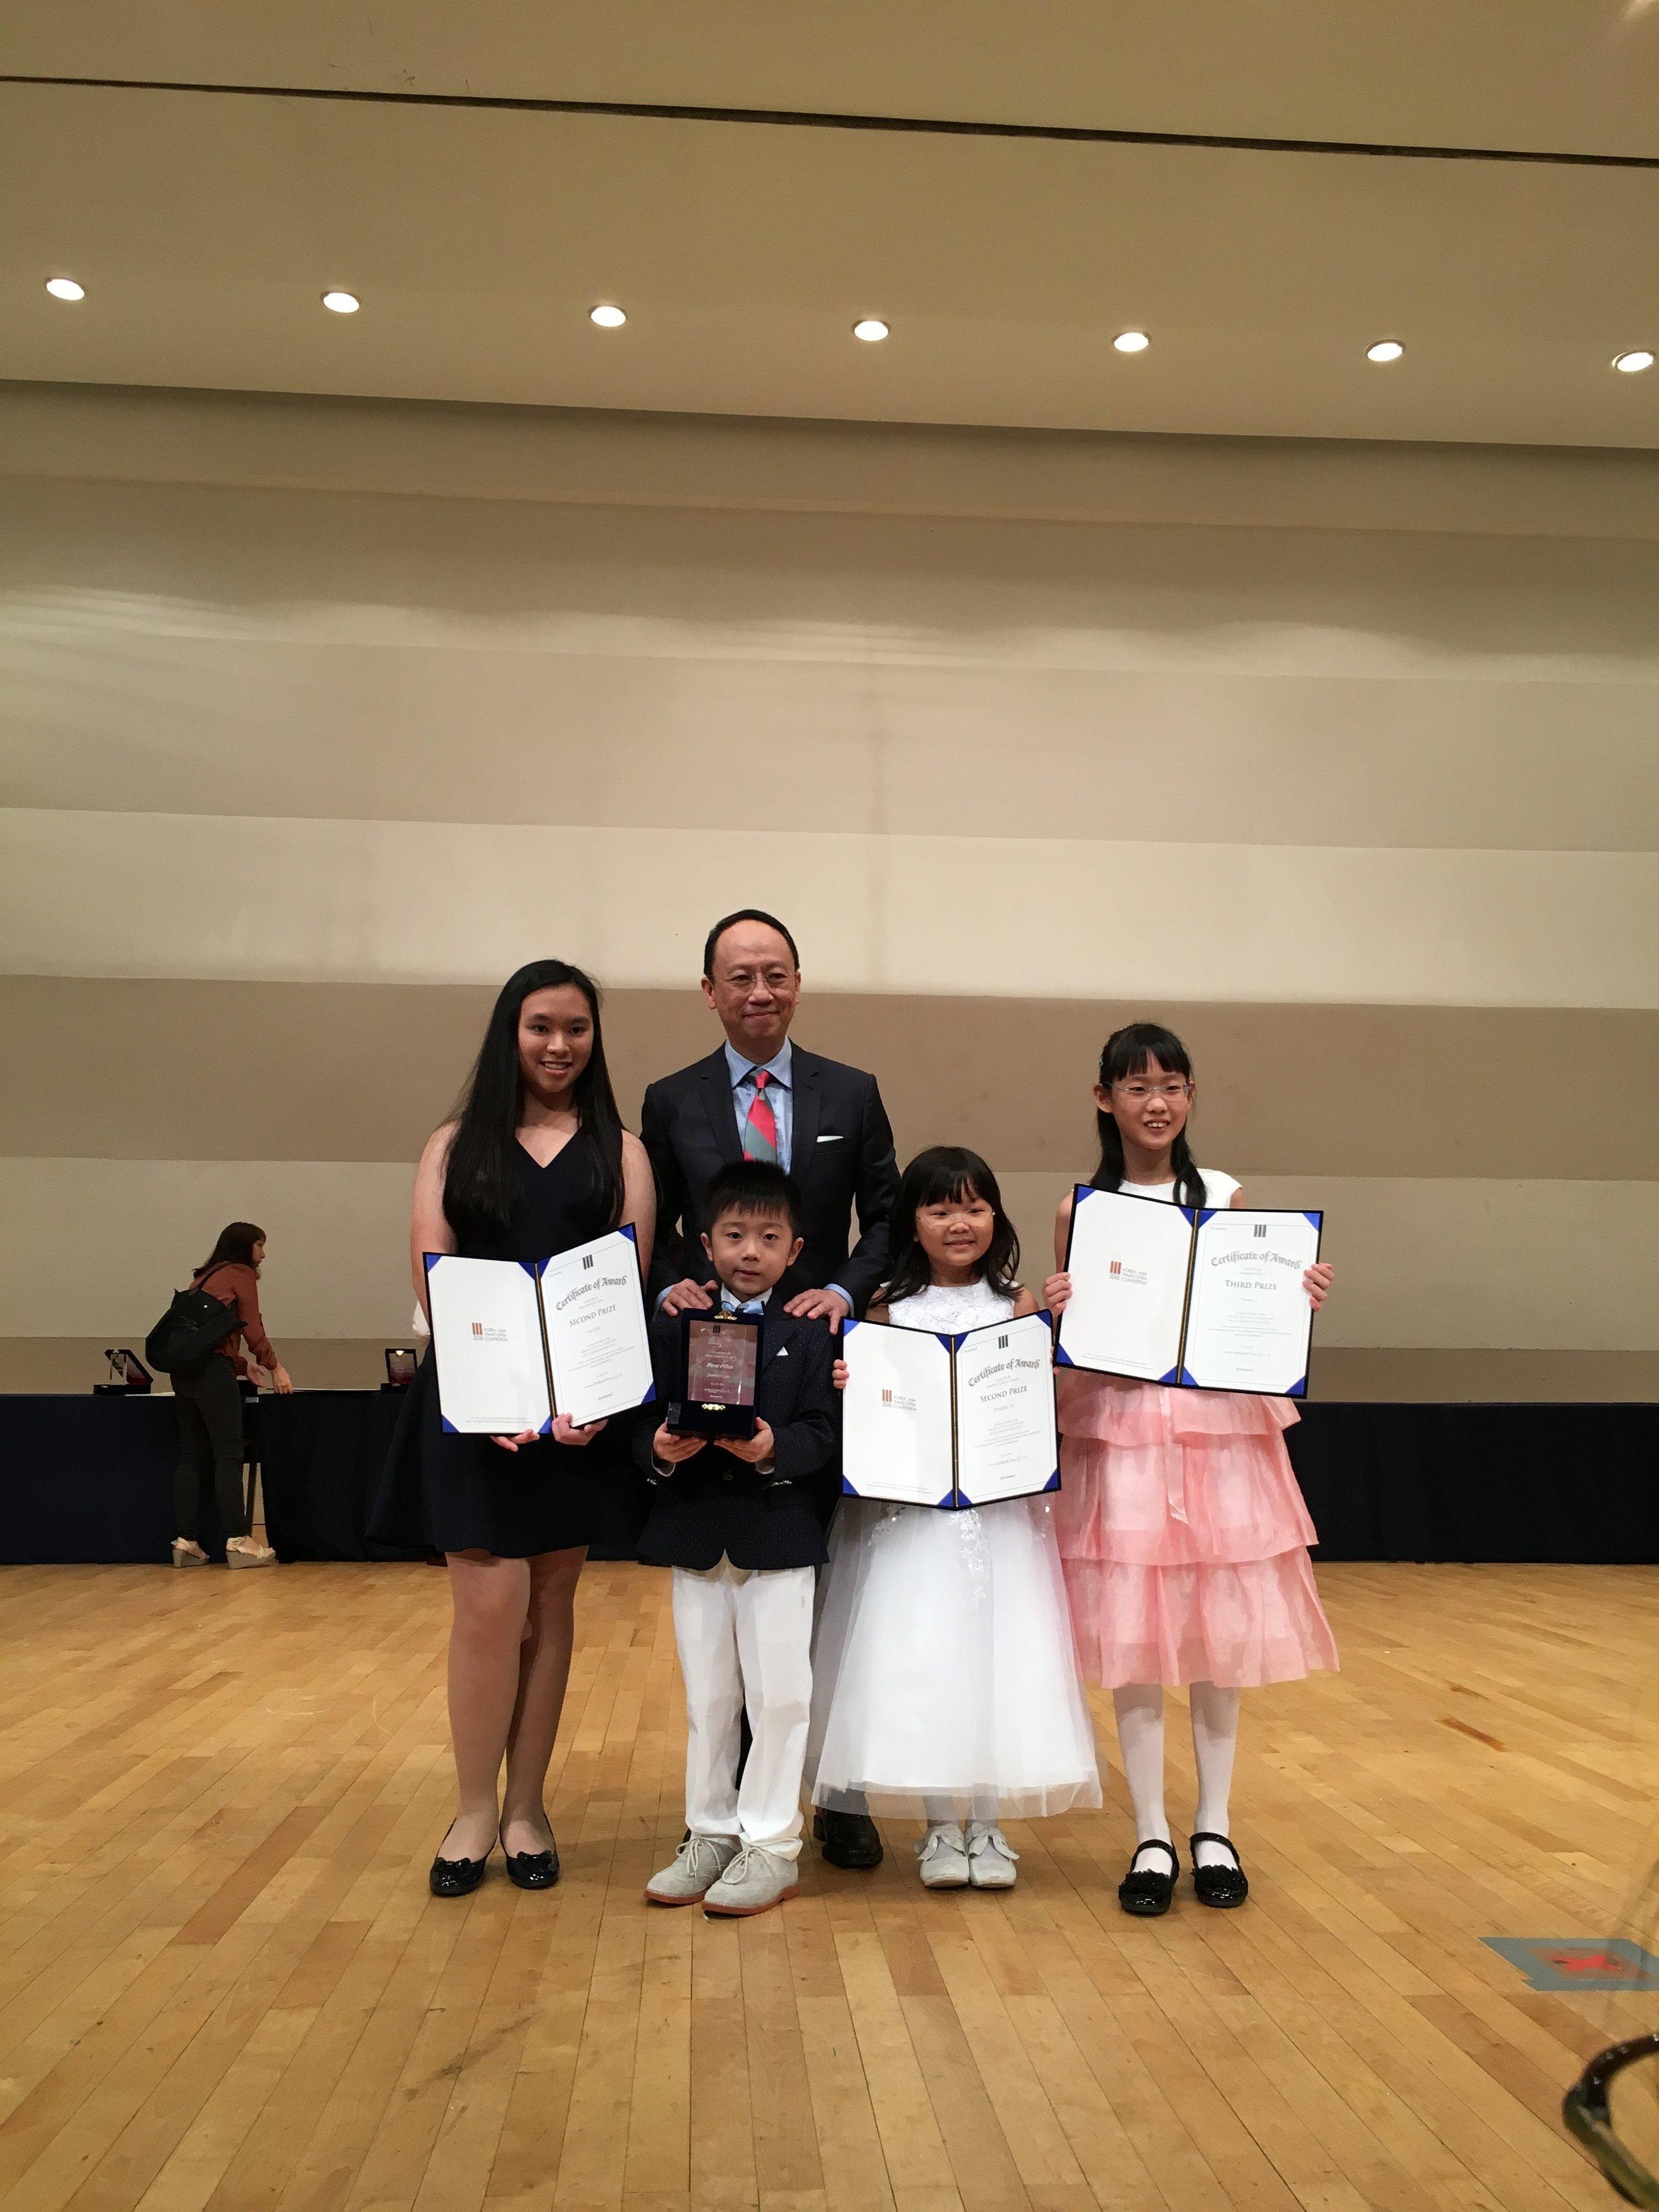 With my four prize-winning students, (from left) Jovi Koh, Cao Junwei, Yu Junqing & Vivan Li